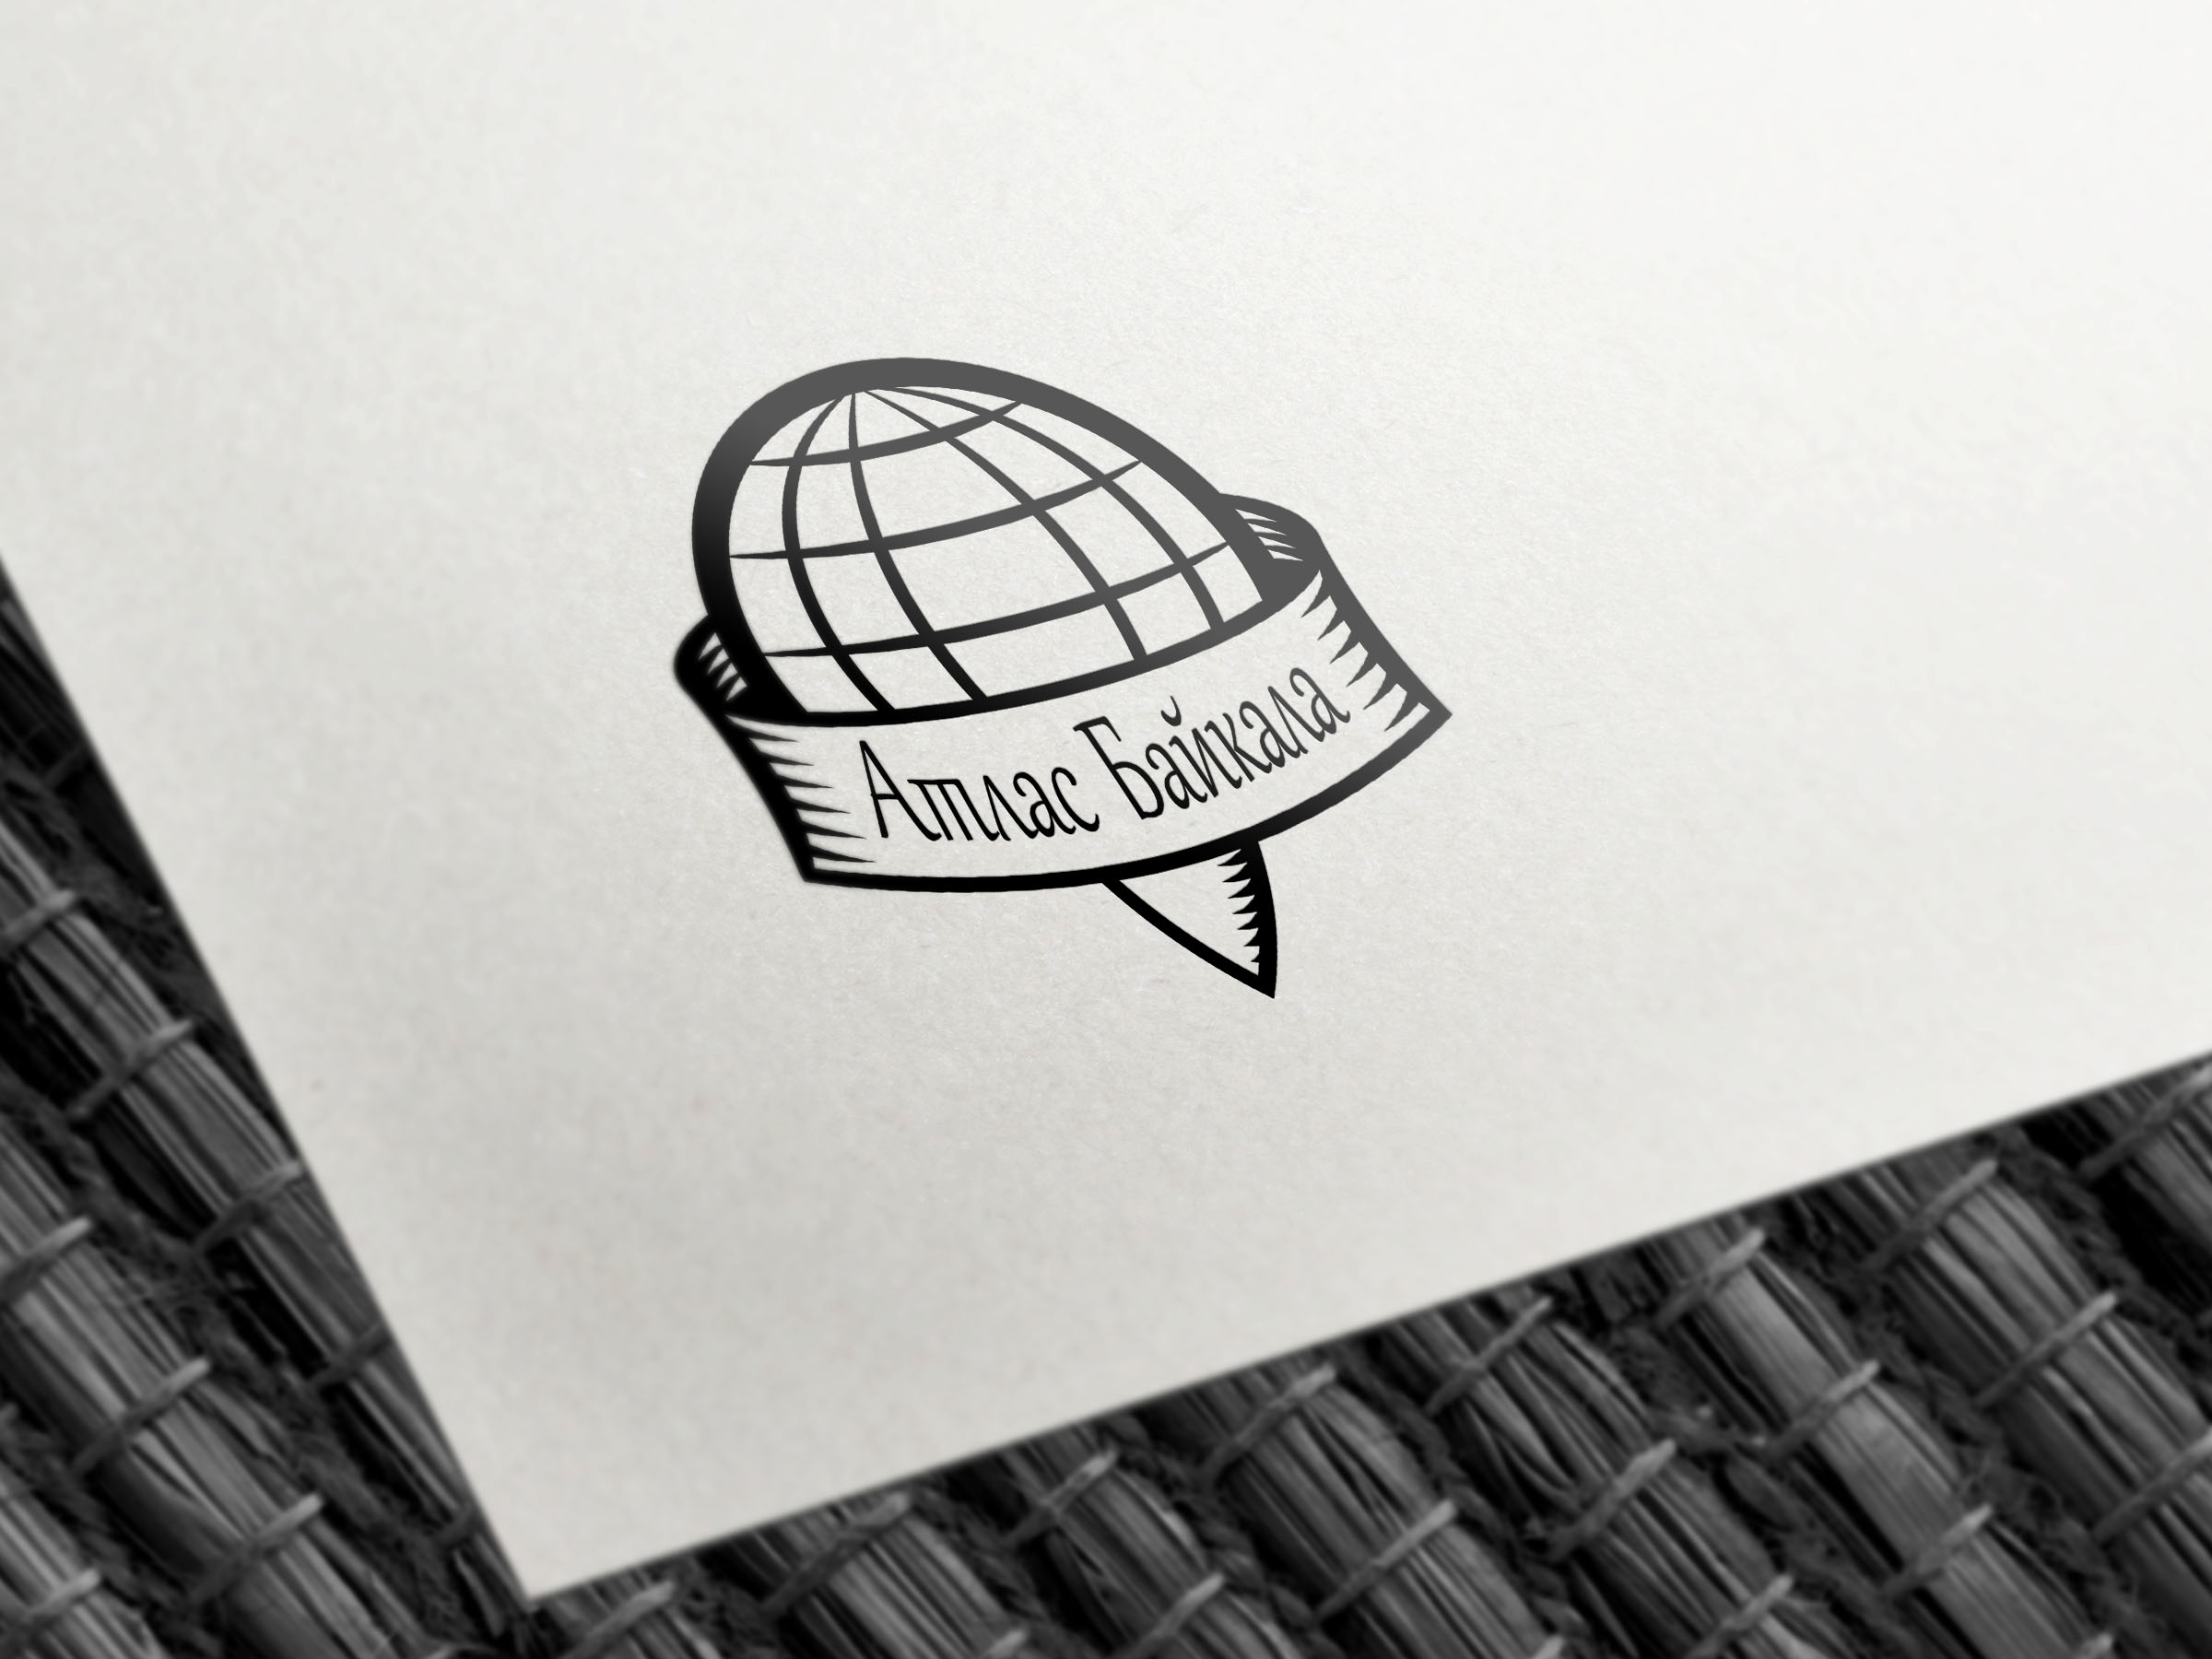 Разработка логотипа Атлас Байкала фото f_3945afa01cf8b48e.jpg